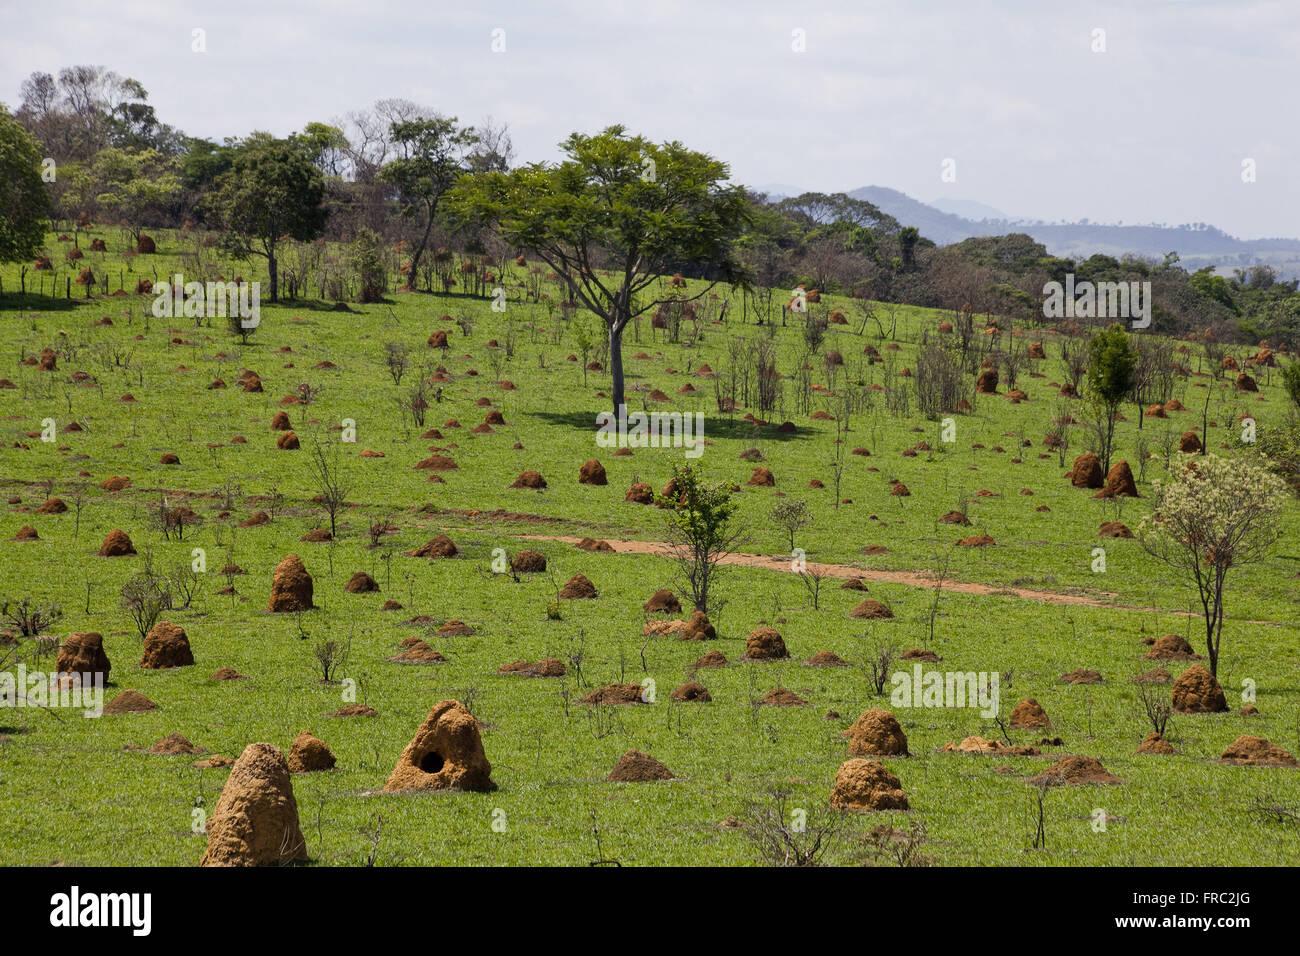 Grassland taken by termites - Stock Image